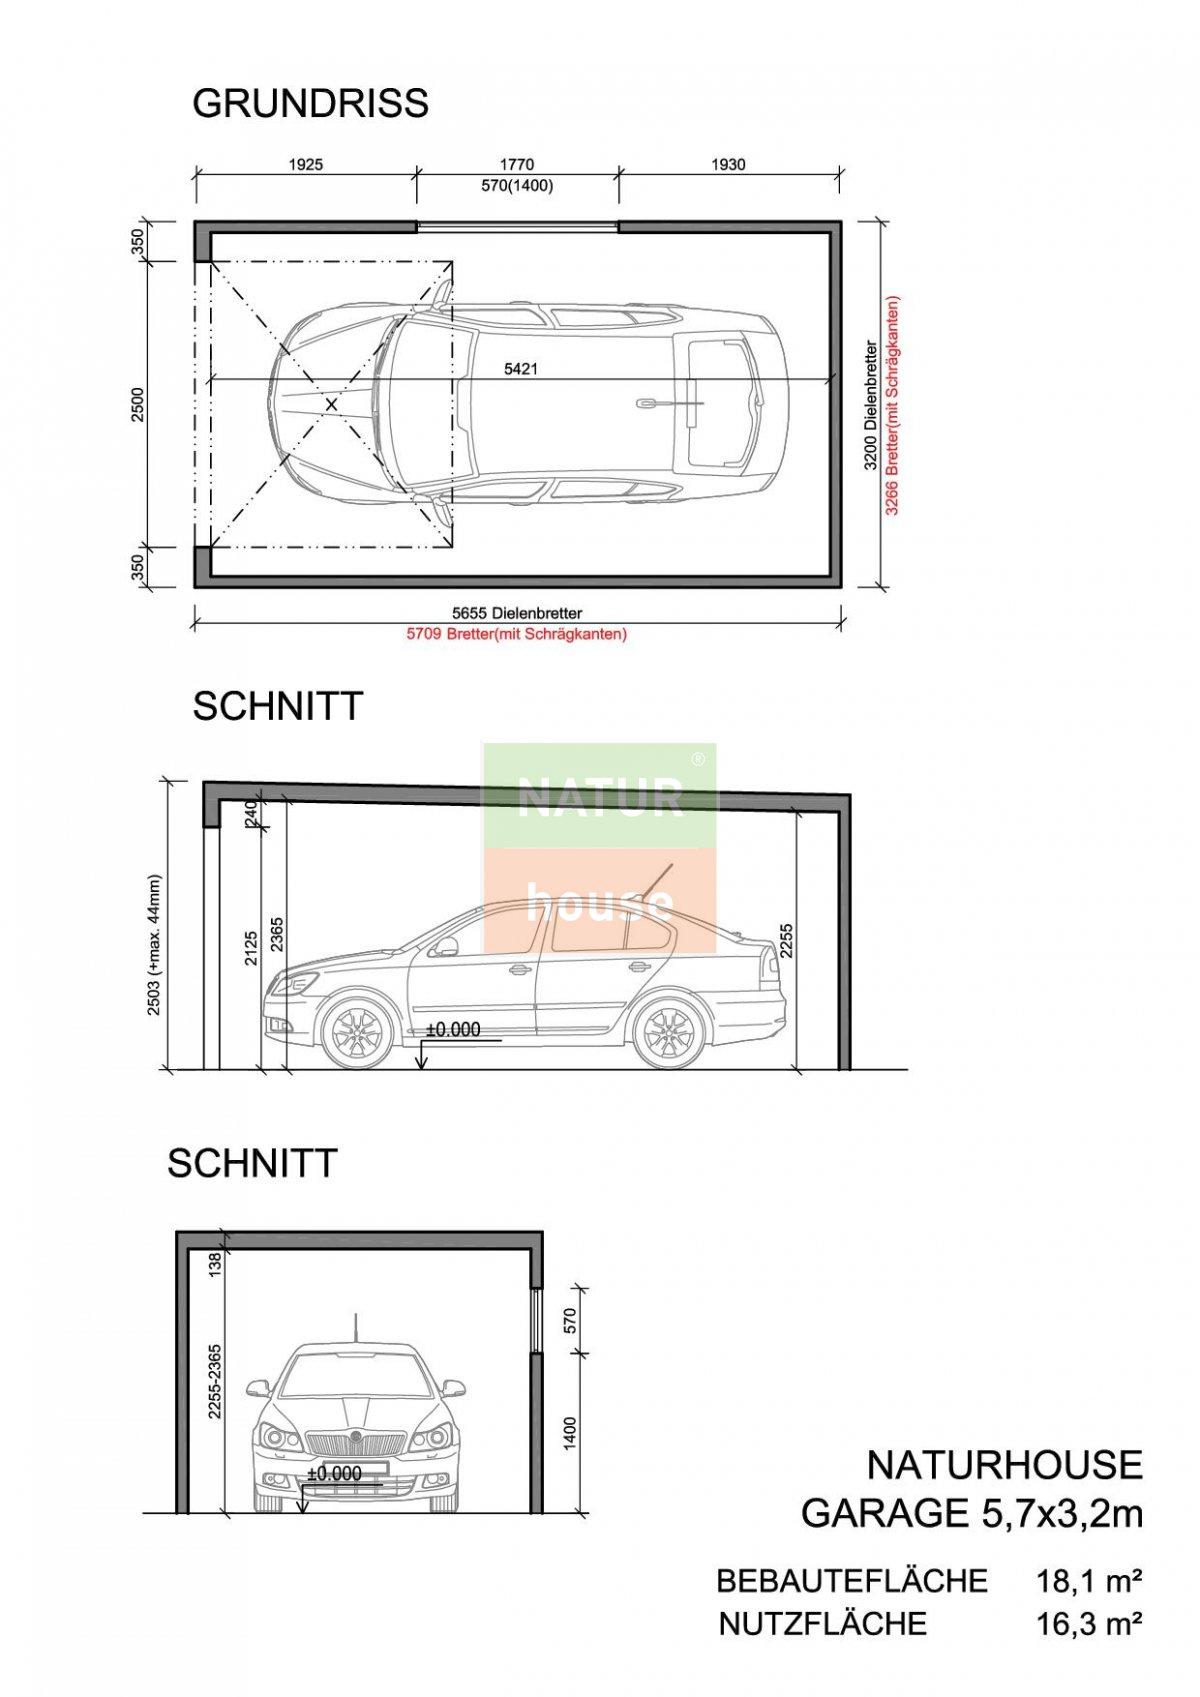 Fertiggarage grundriss  Montierte Holzgaragen 5,7x3,2 m | NATURHOUSE® -